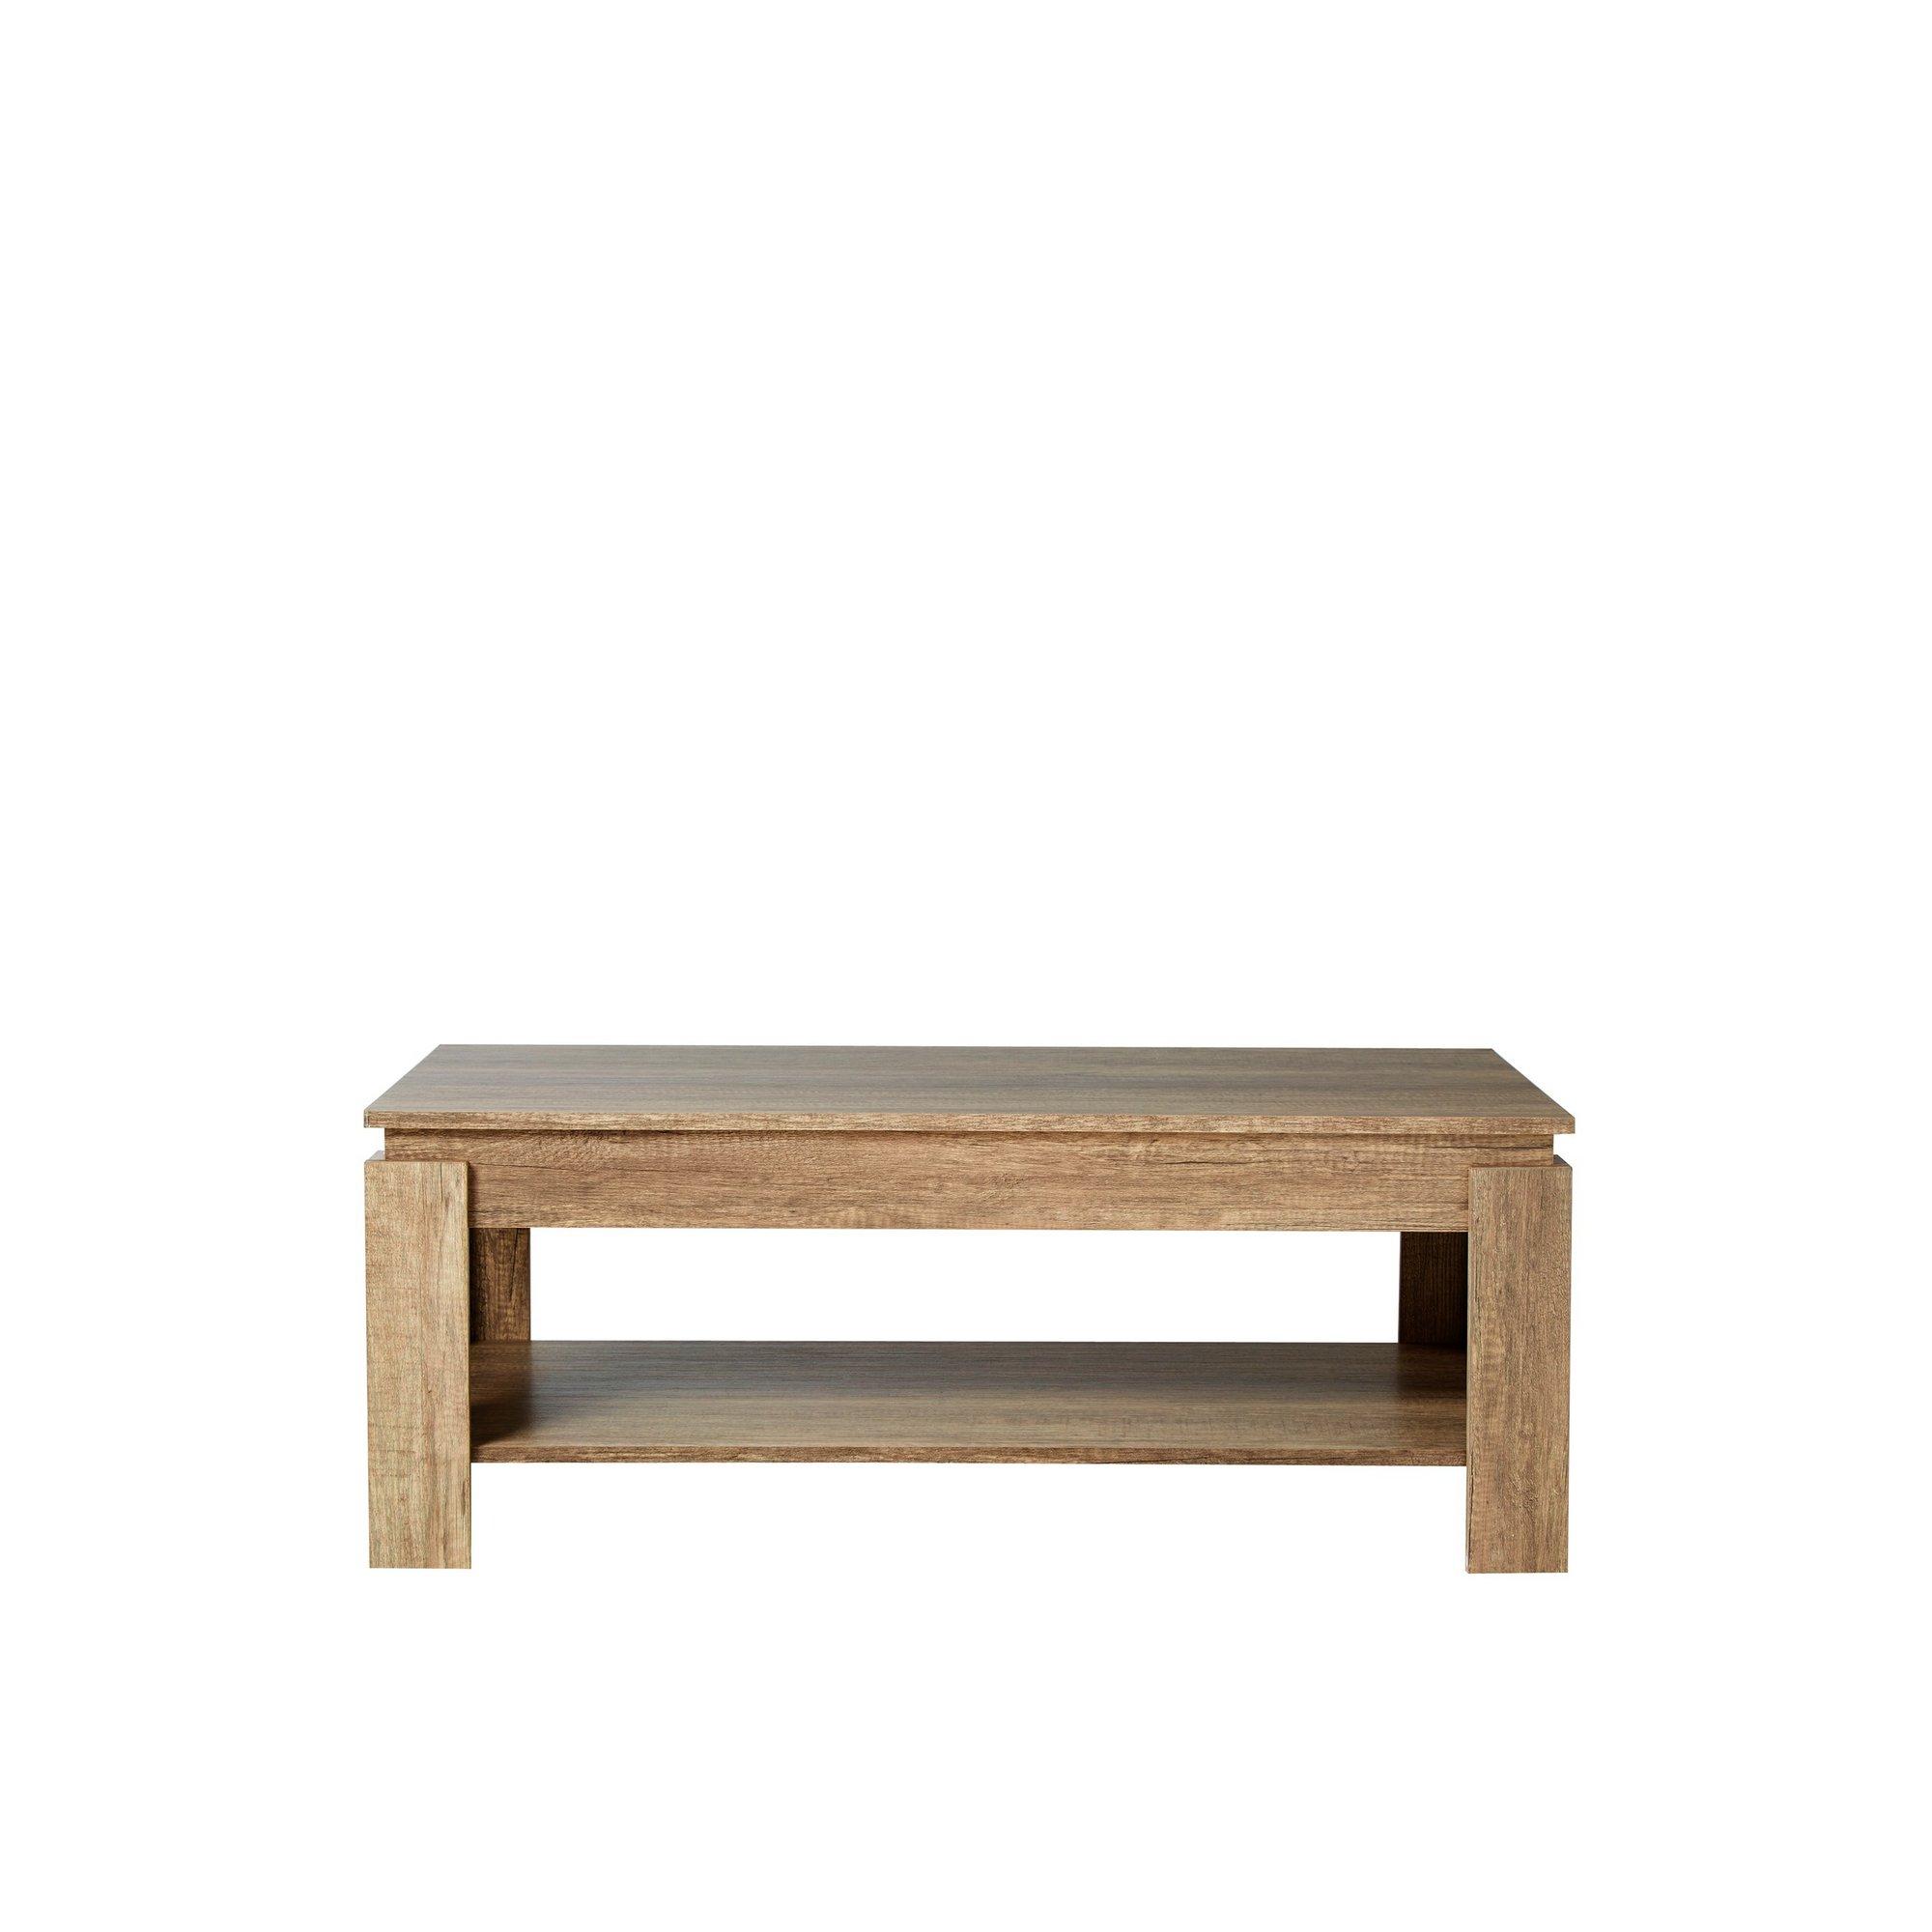 Image of Canyon Oak Coffee Table